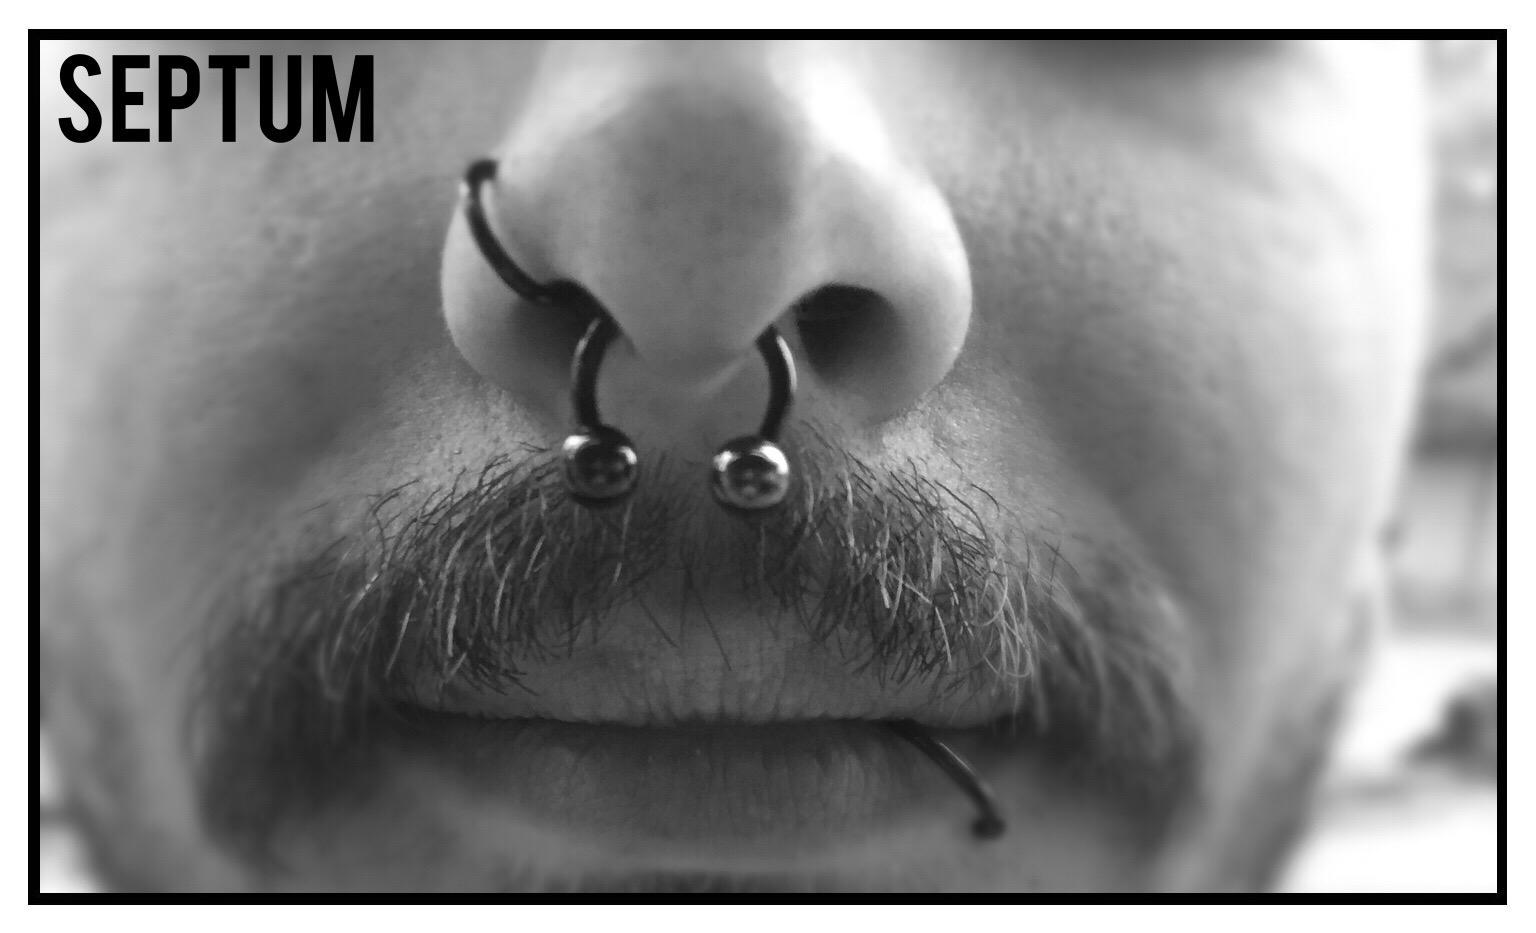 Septum | Michi | Newborn Tattoo Wolfratshausen